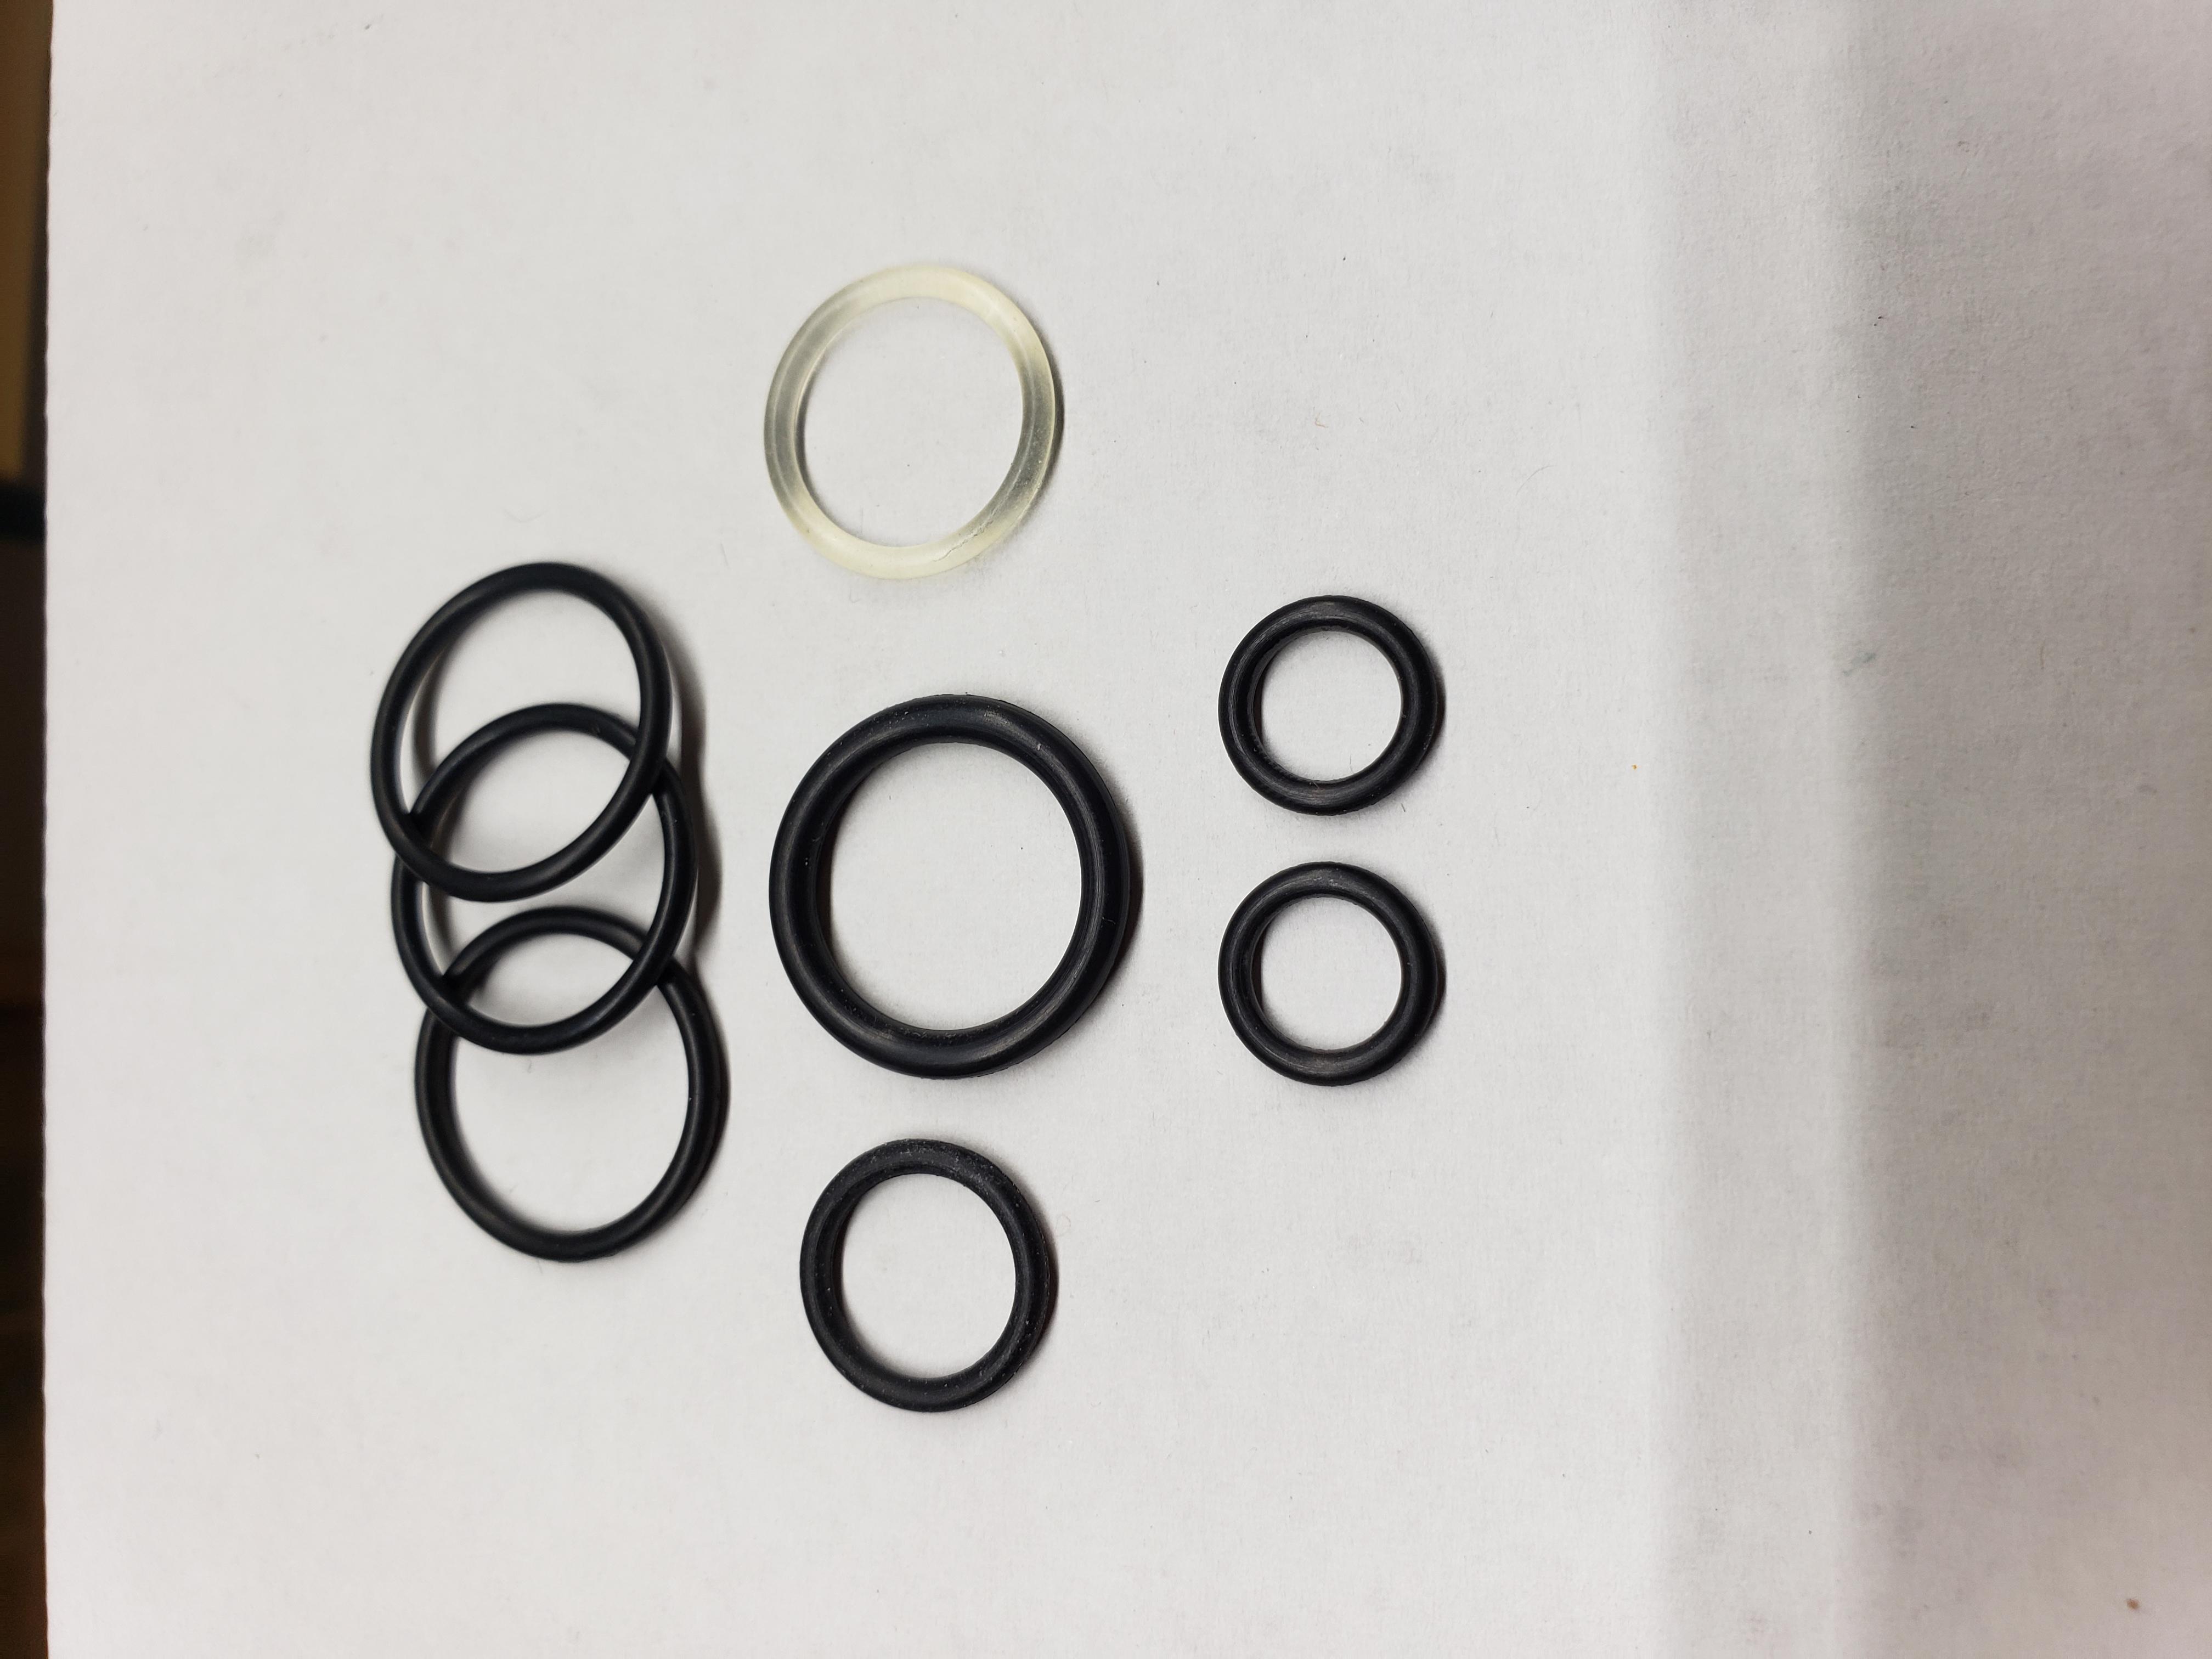 SST HPR O-Ring rebuild.